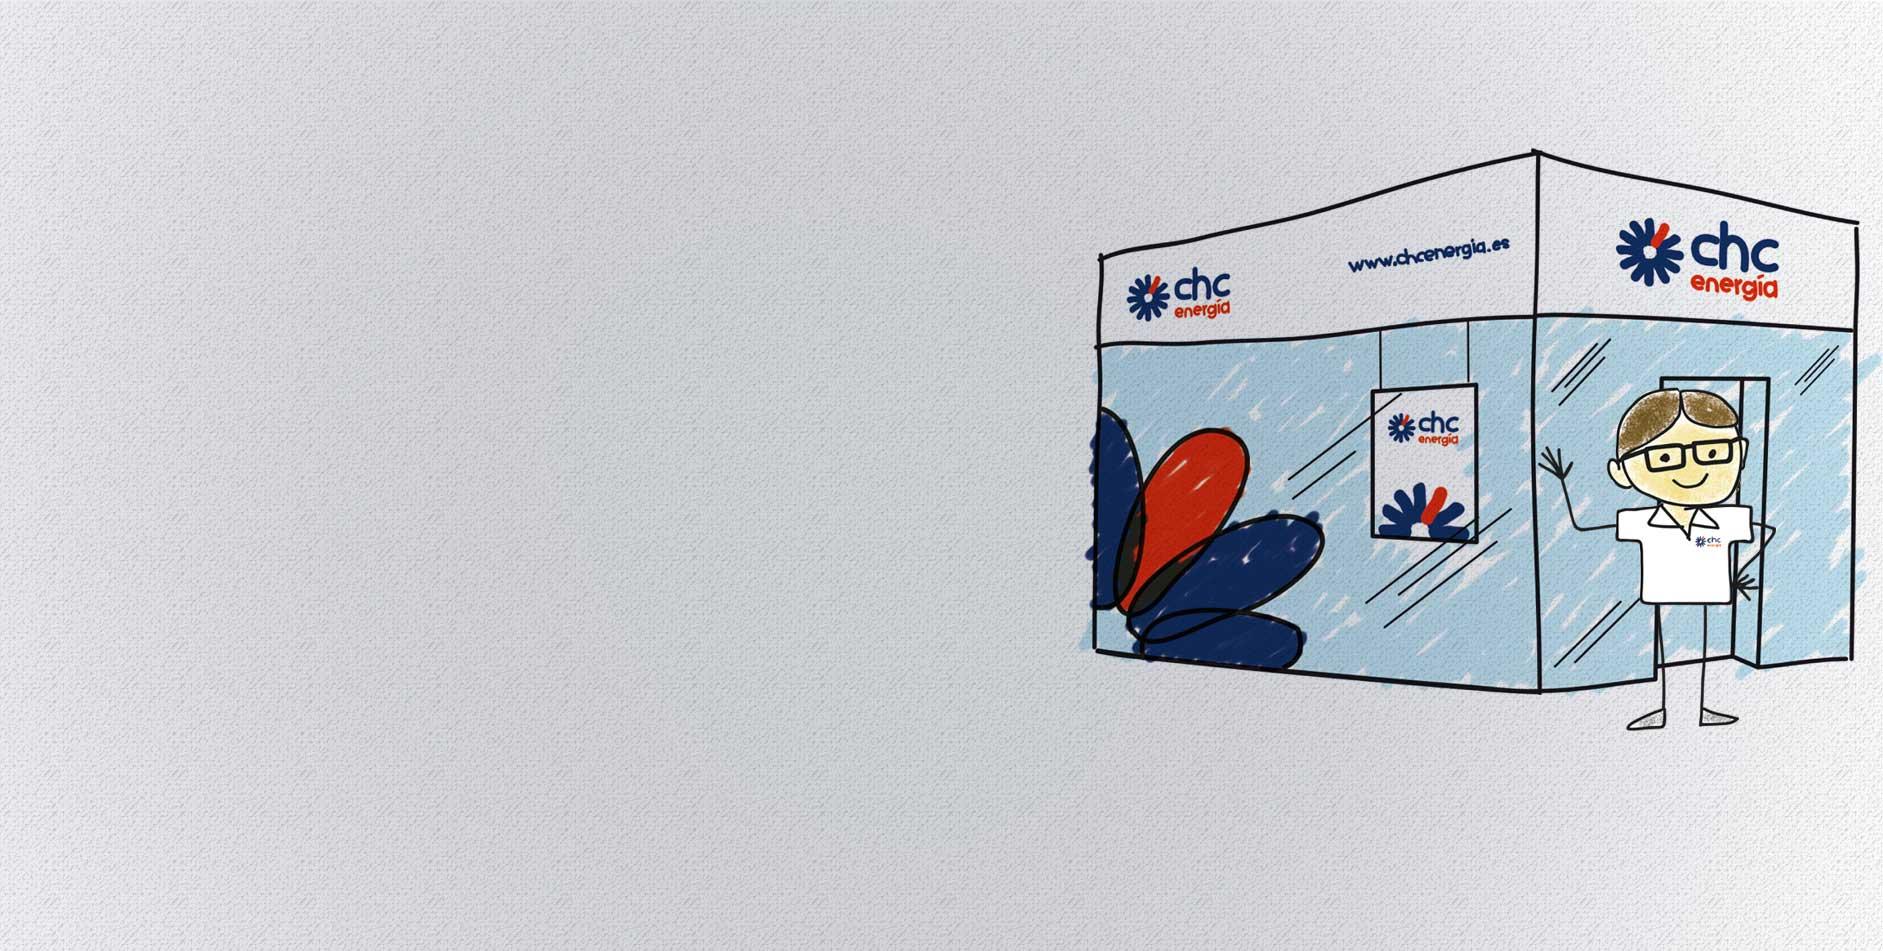 Portal chc energ a chc energ a web for Oficina postal mas cercana